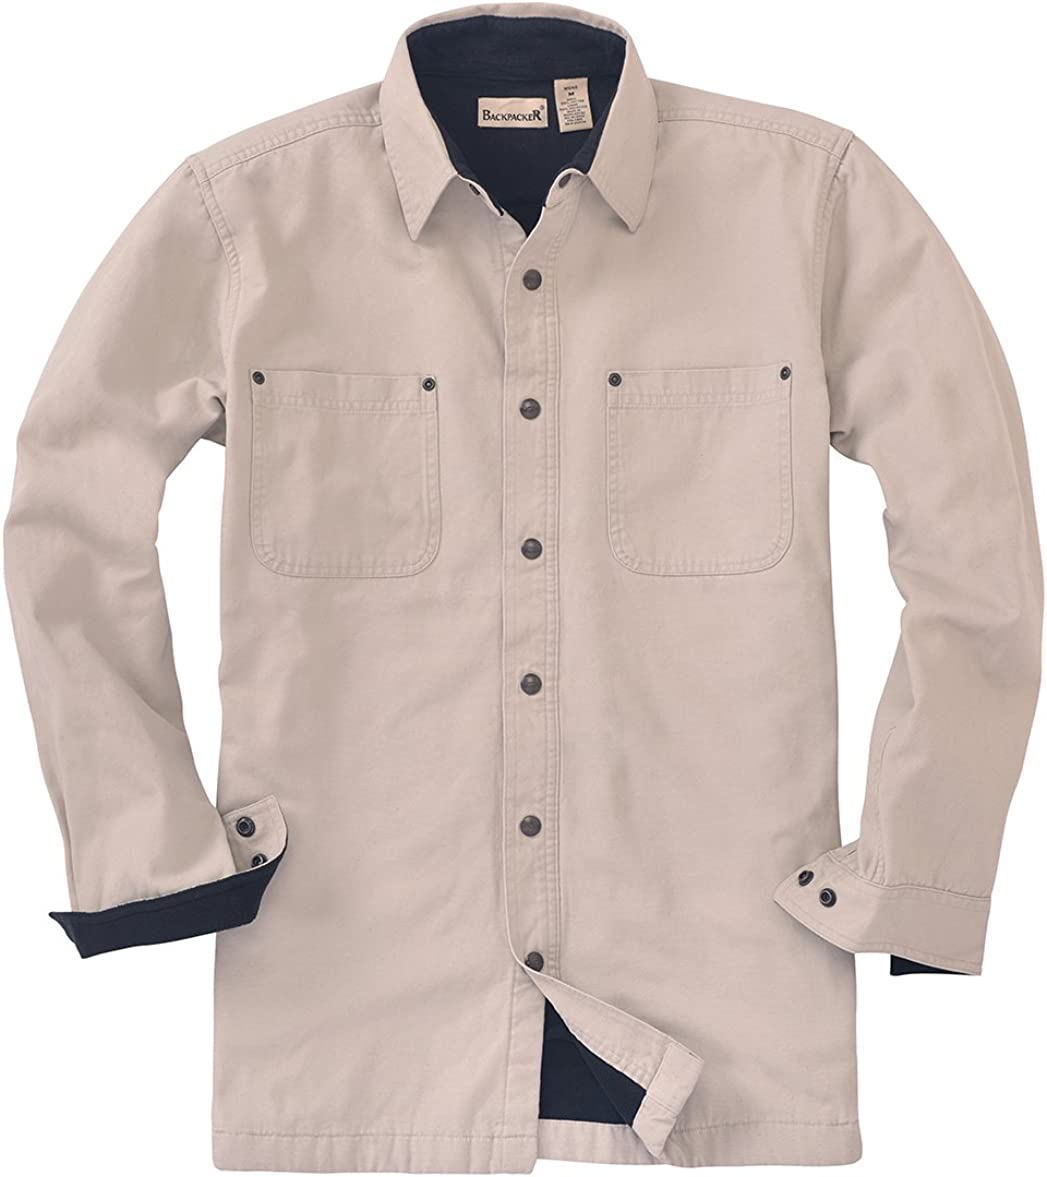 Backpacker Canvas/Fleece Lined Shirt Jacket